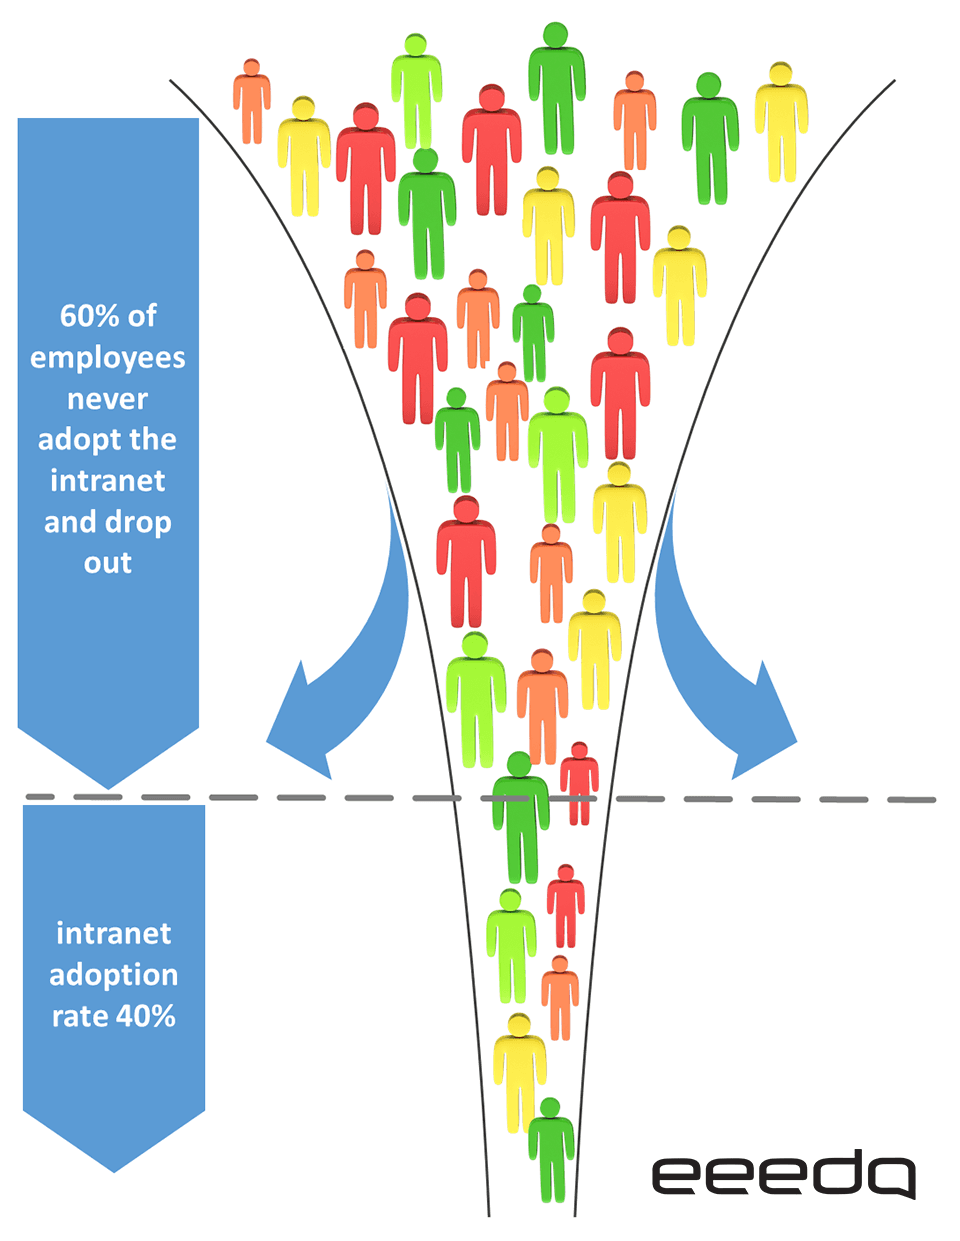 Intranet adoption rate